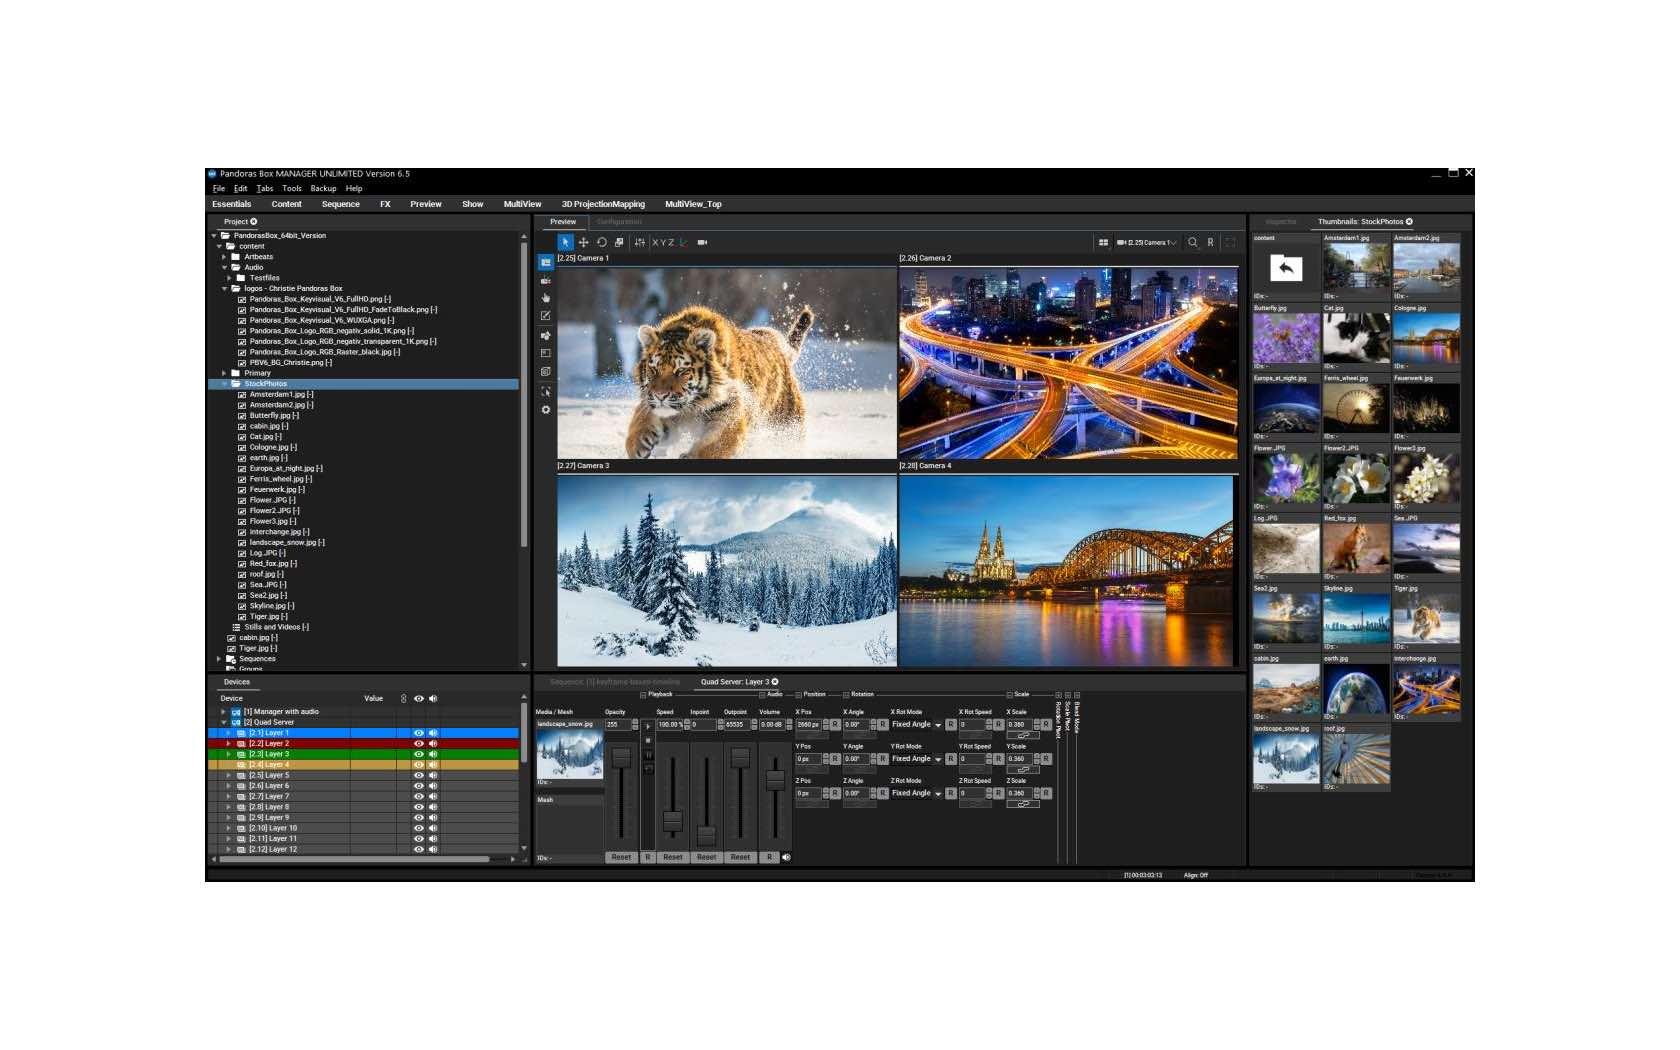 Christie releases Pandoras Box software version 6.5